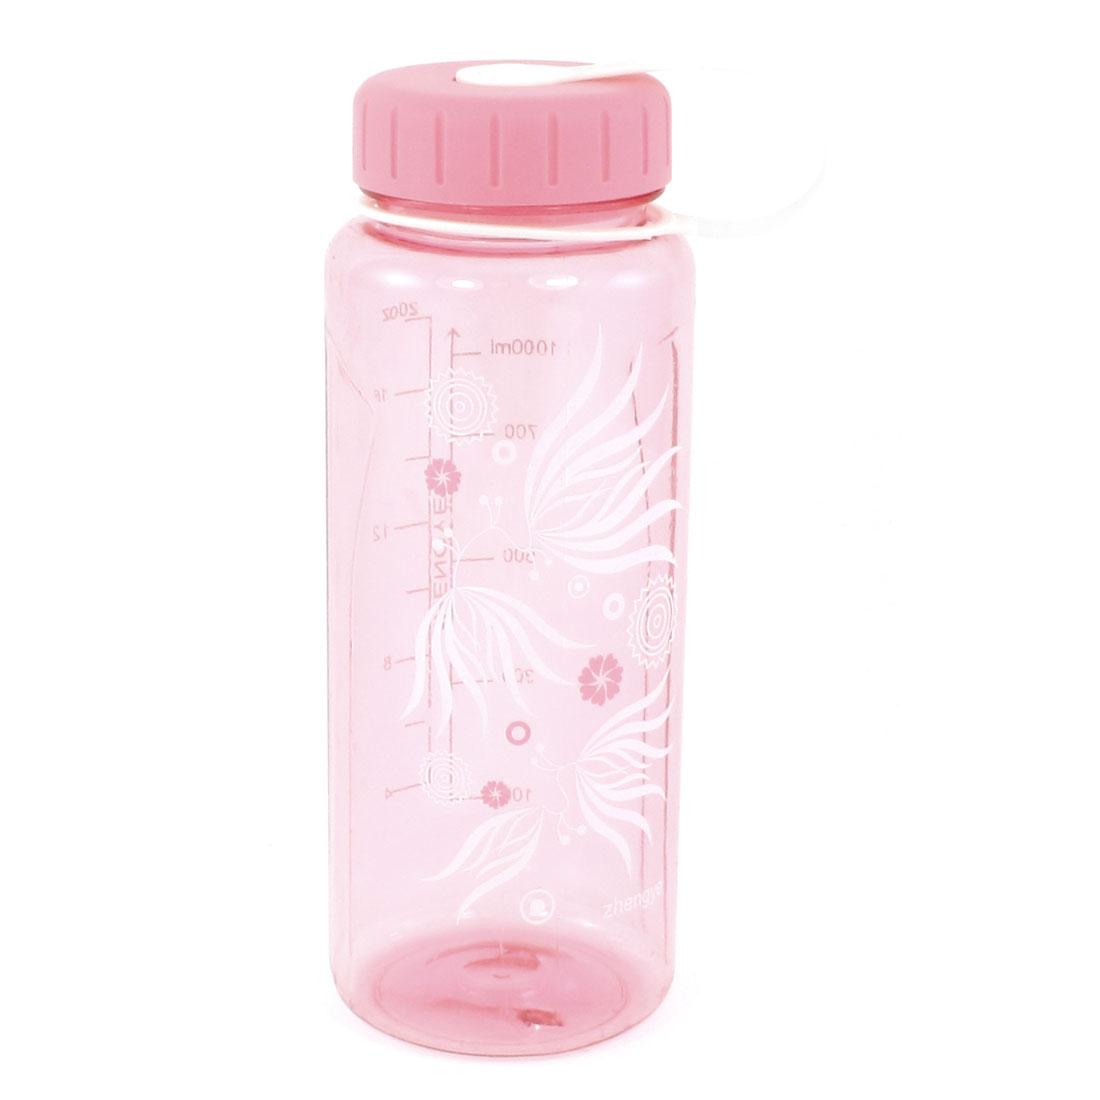 Flowers Leaf Print Clear Pink Leakproof Plastic Sports Water Bottle 1000ml